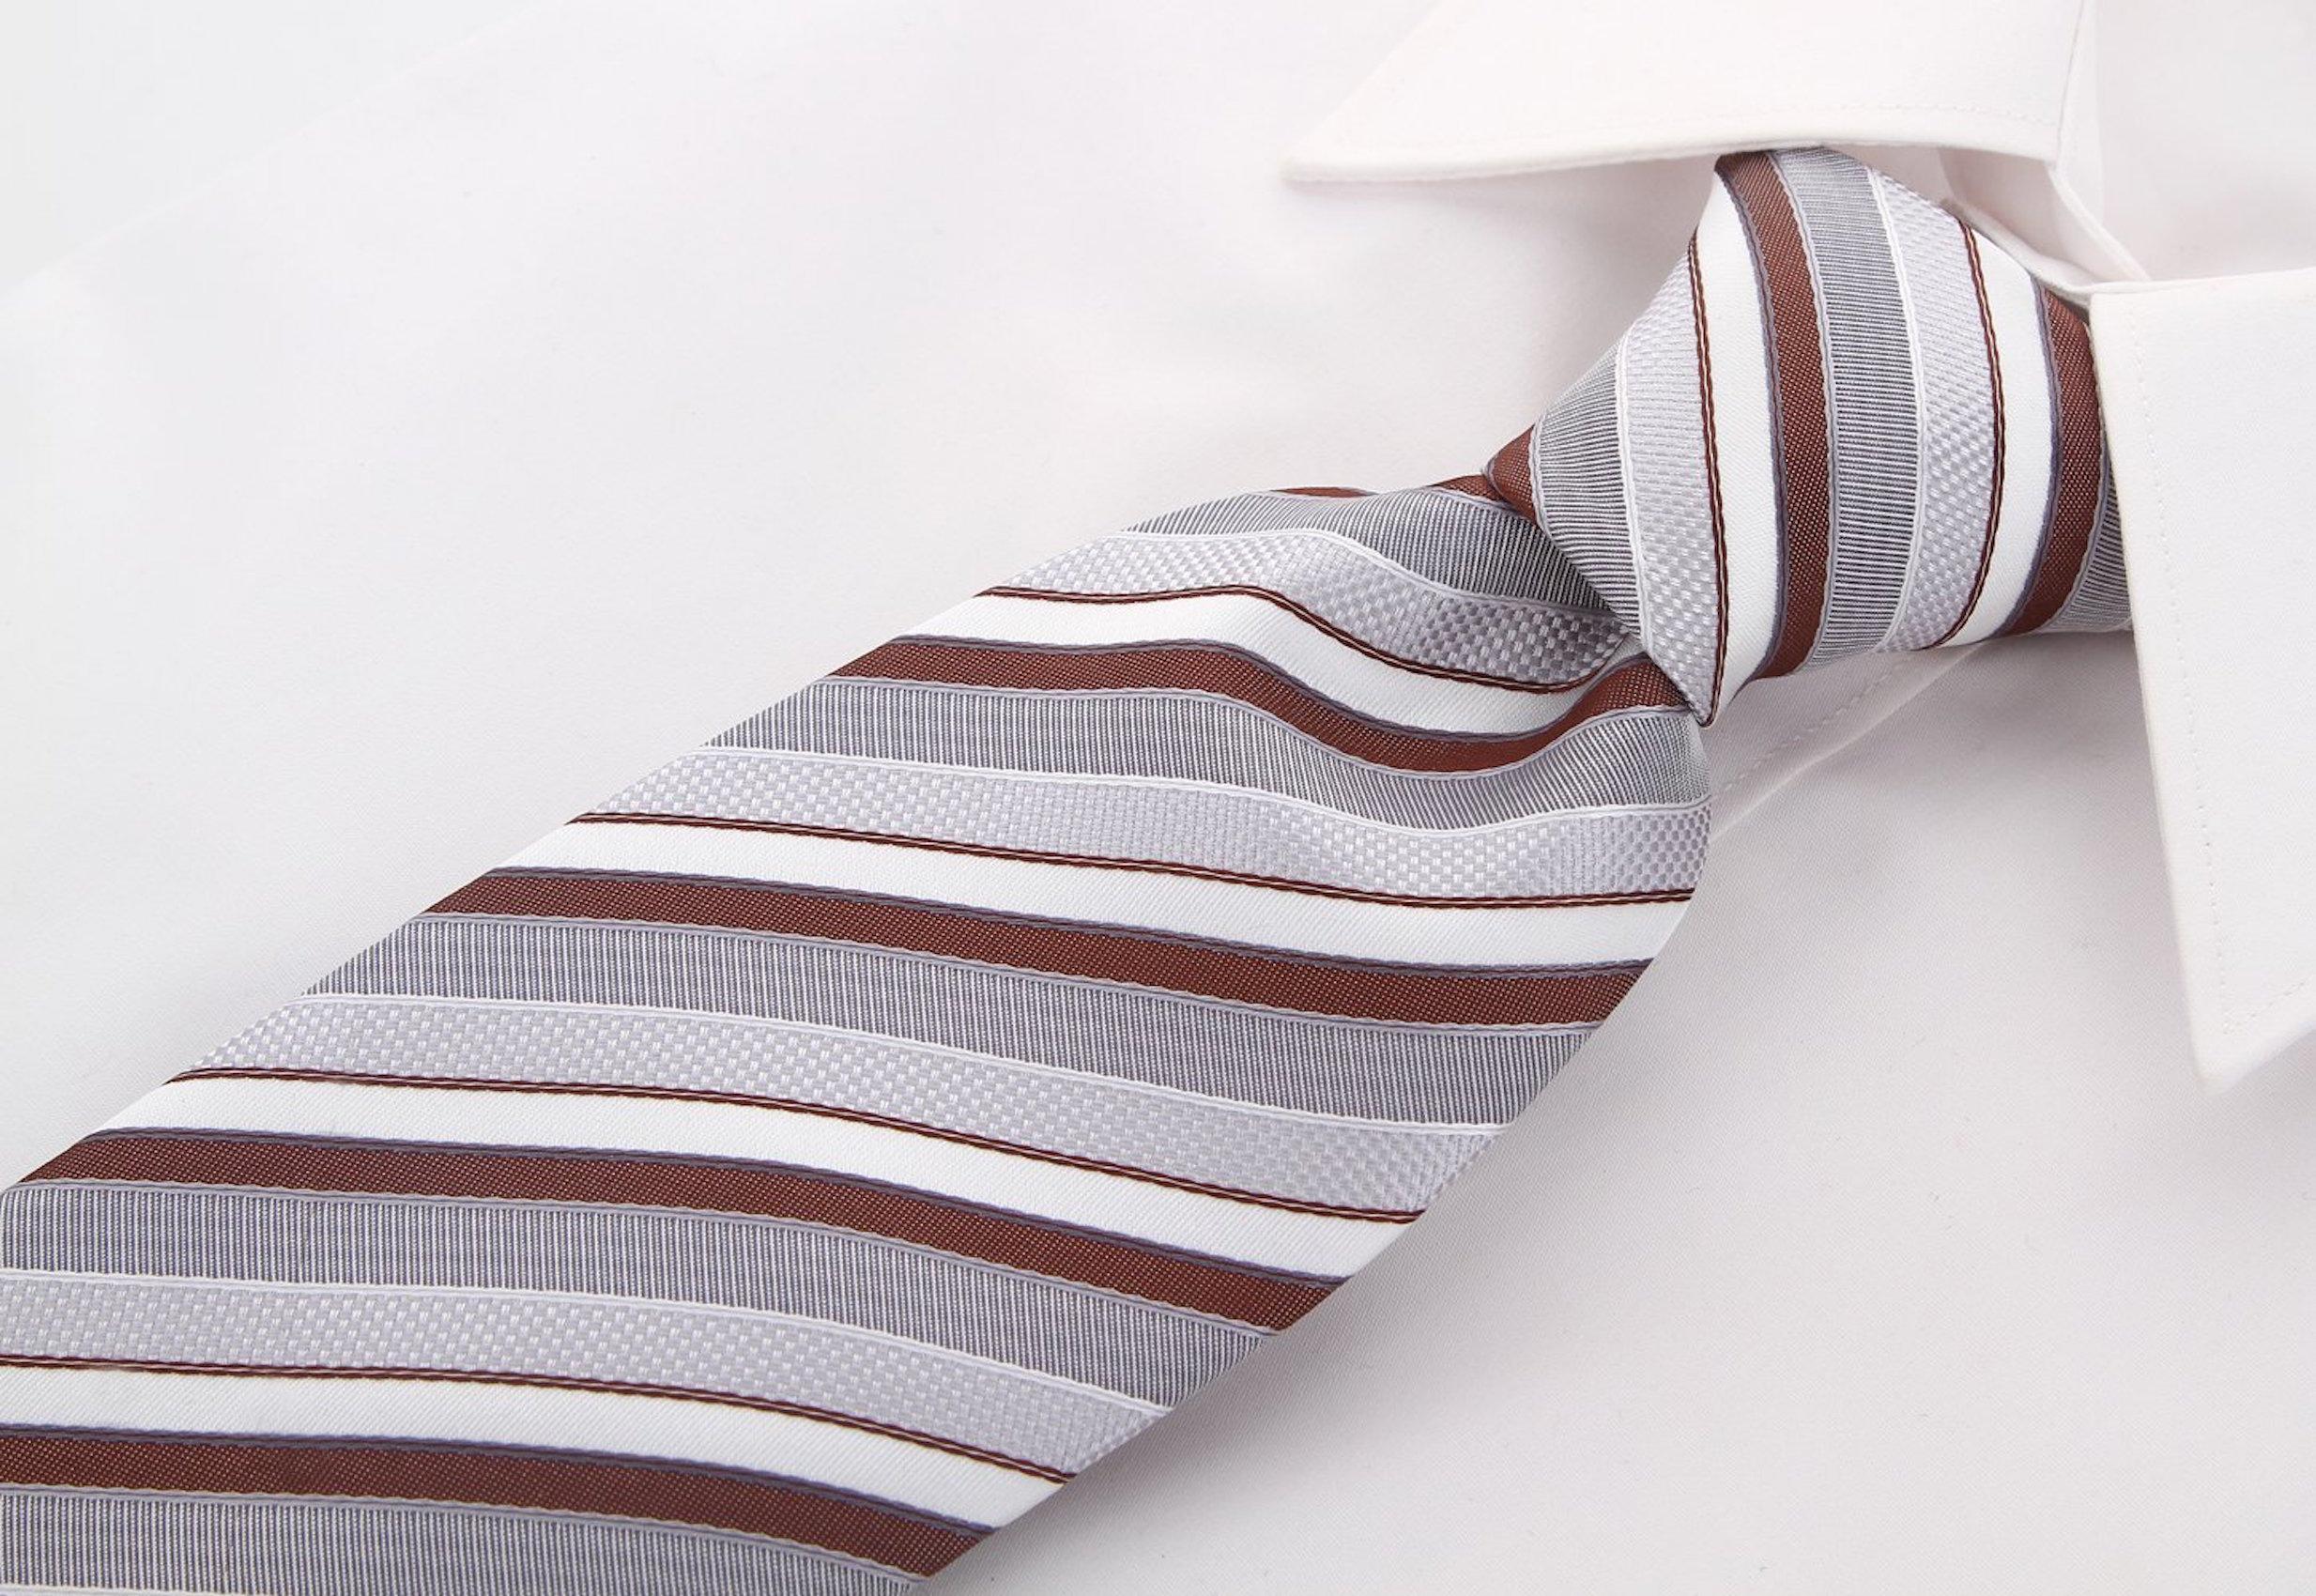 Scott-Allan-Striped-Necktie-Mens-Ties-in-Various-Colors thumbnail 8